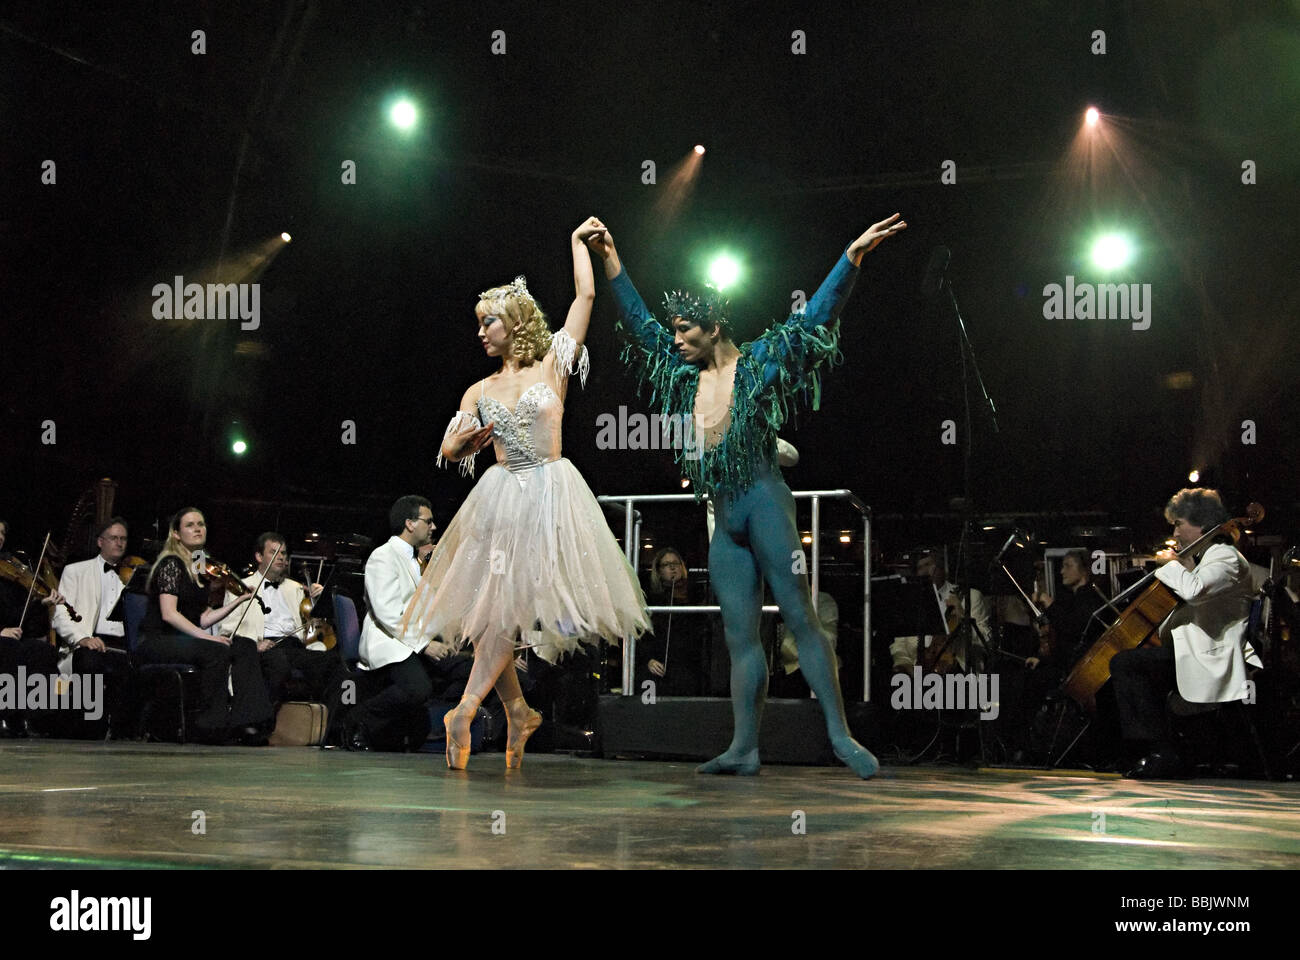 birmingham royal ballet dancer at artsfest 2008 - Stock Image